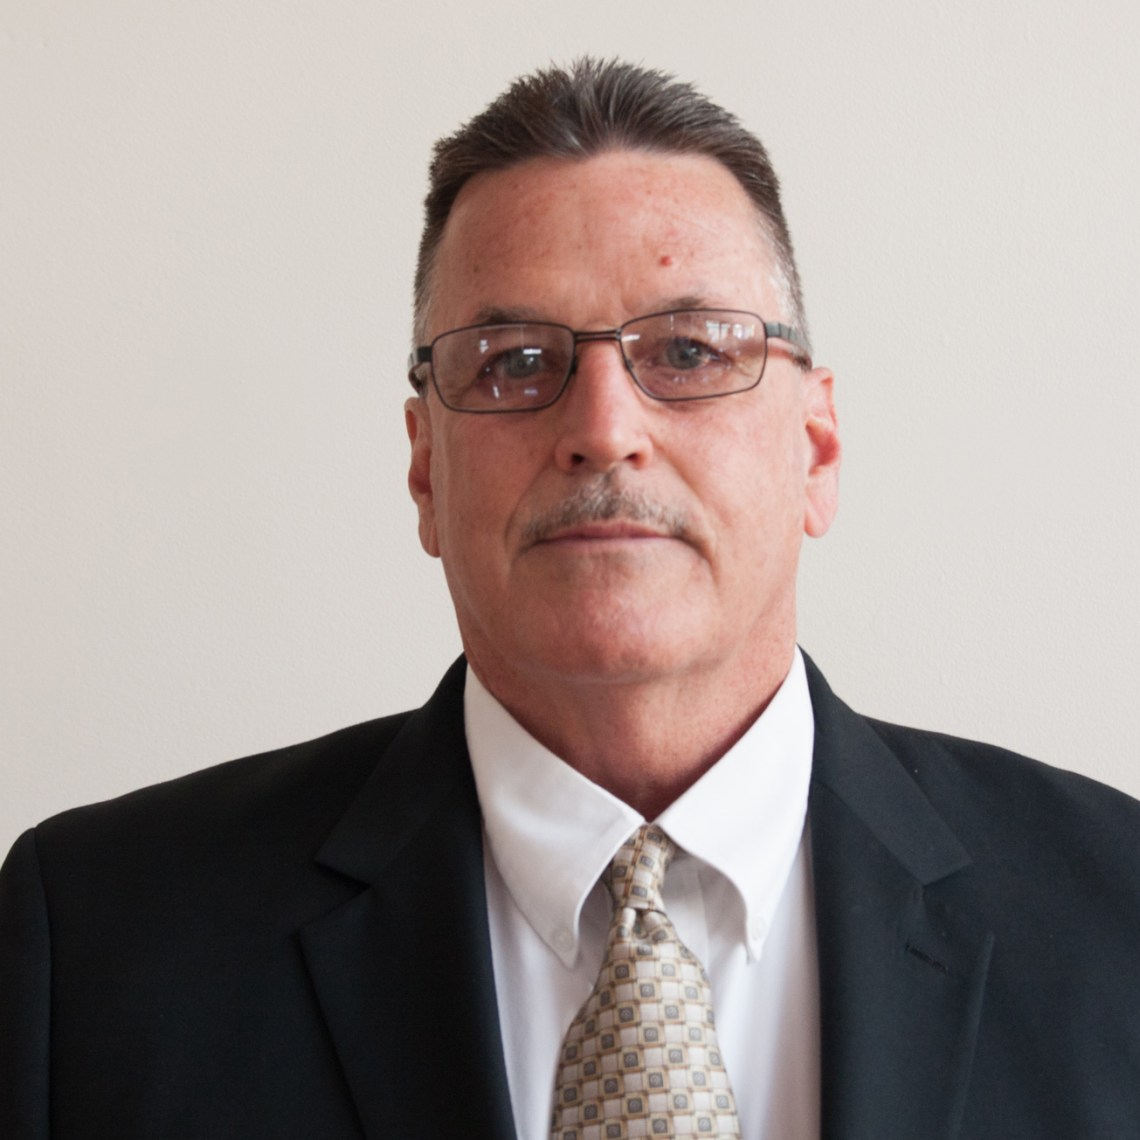 Jeff Sullivan, Vice President